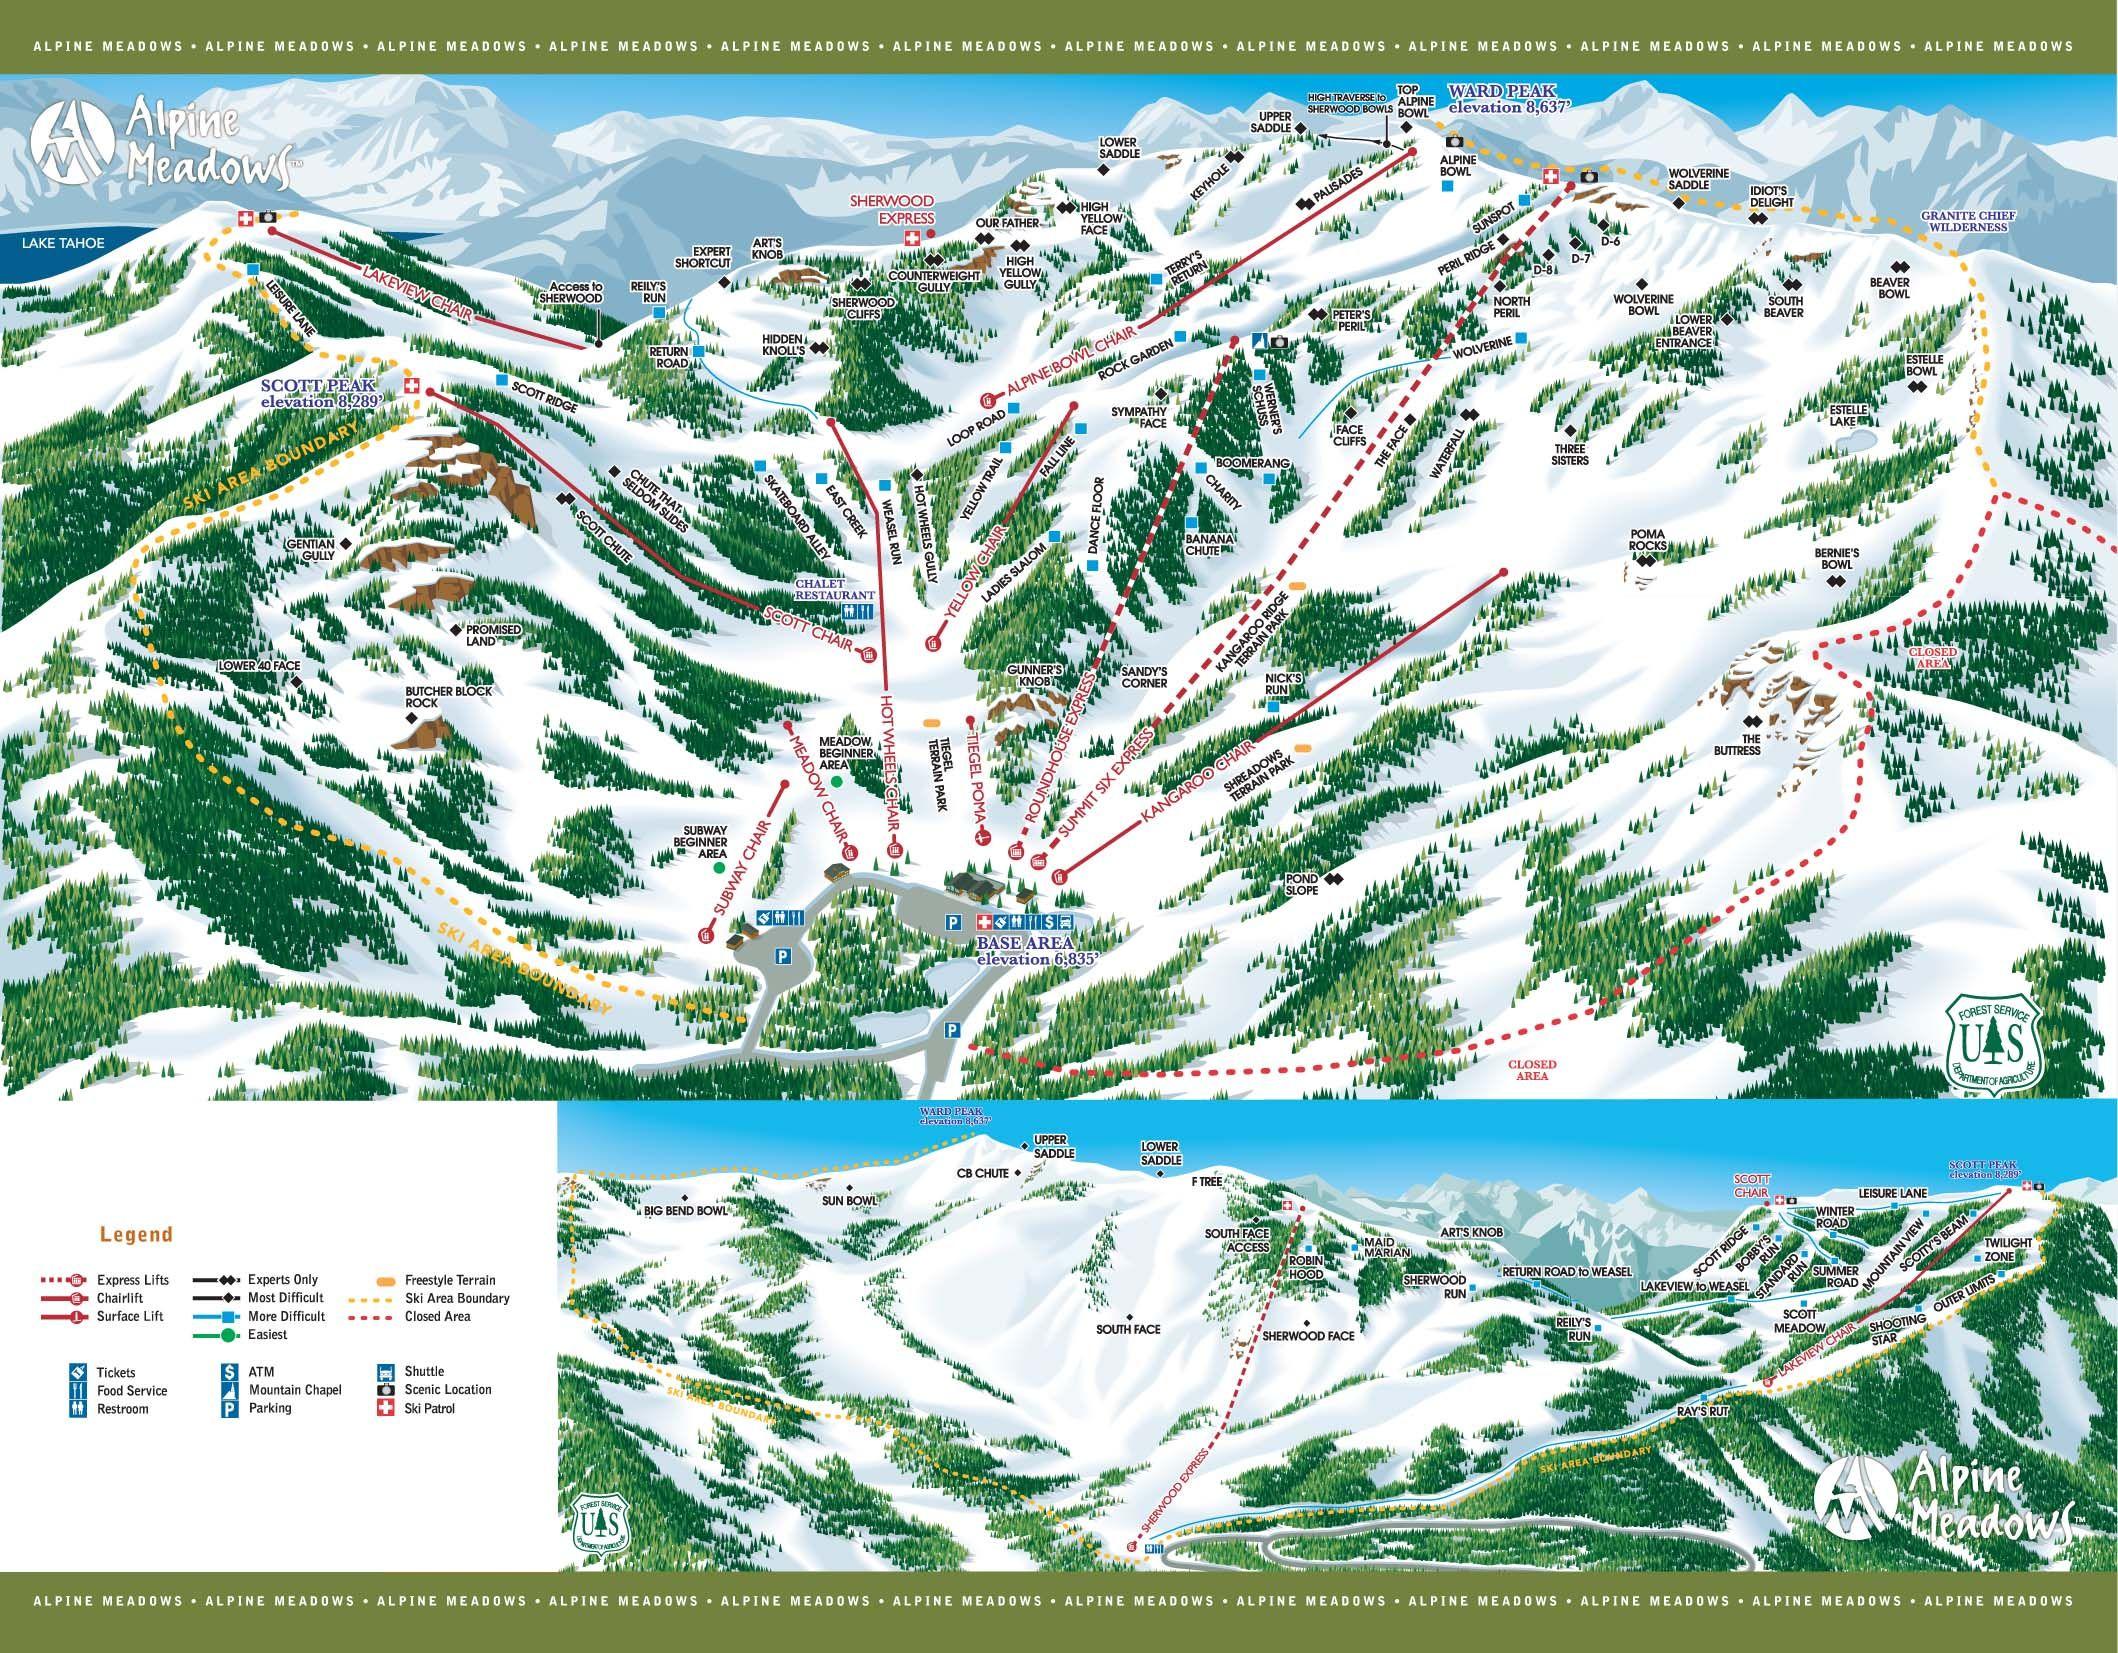 alpine meadows ski resort | ski resorts | pinterest | skiing, alpine